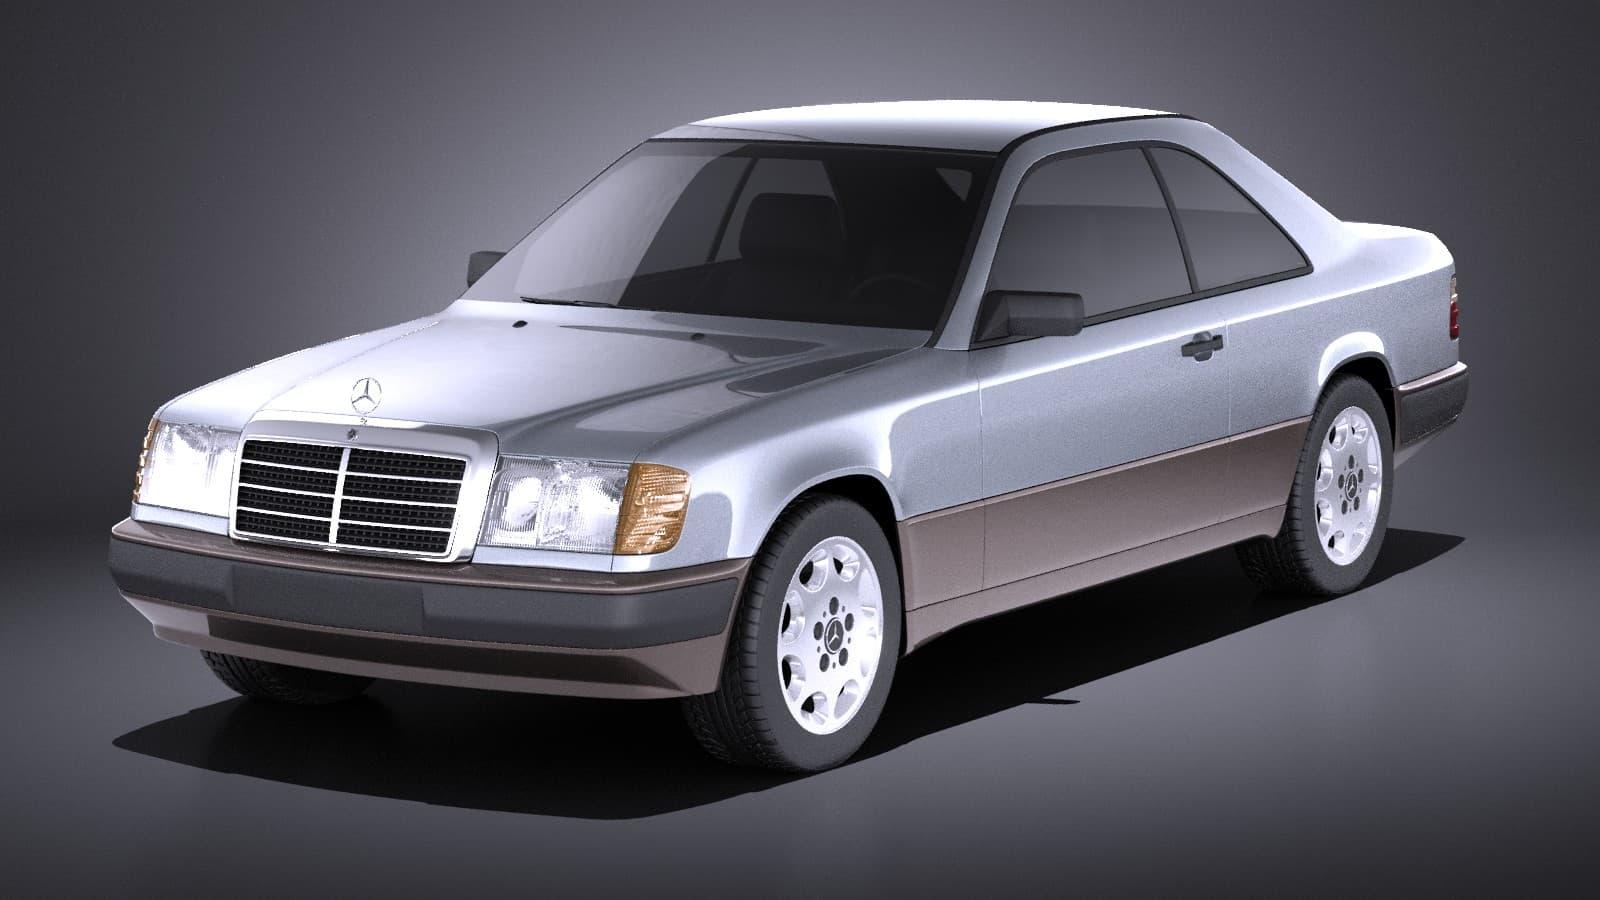 Mercedes E Class W124 Coupe Vray 1990 3d Model